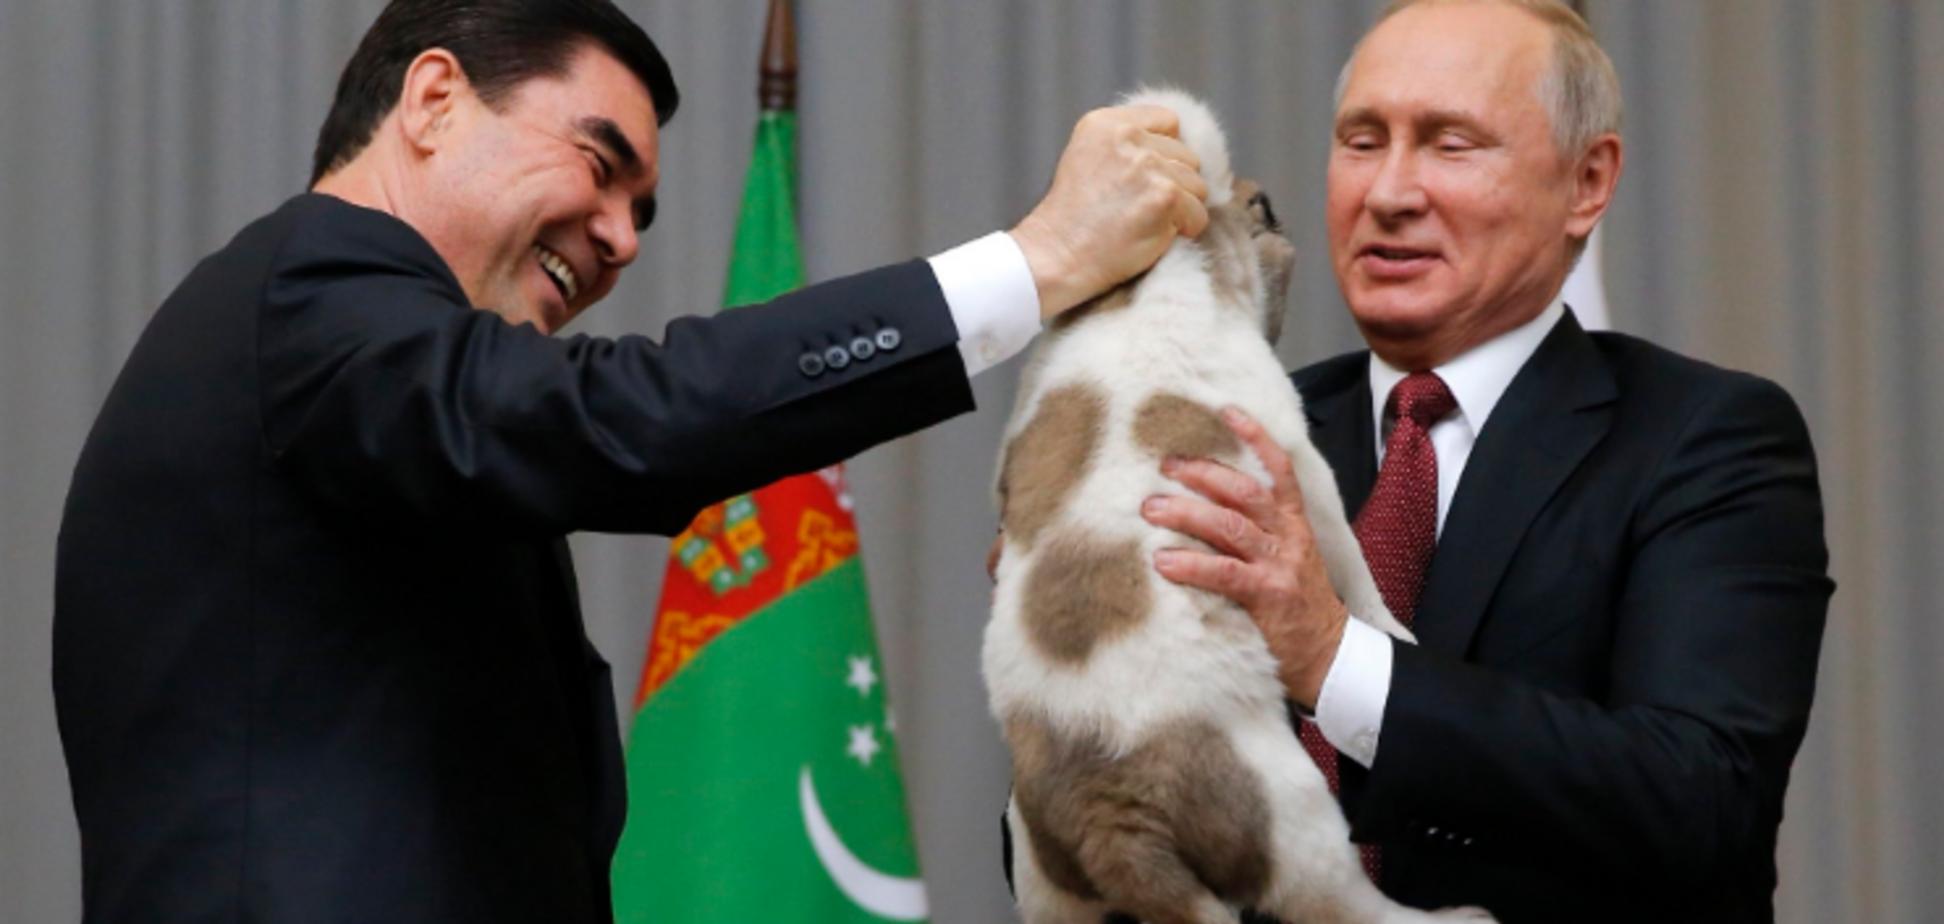 'Жалко собаку!' Путину подарили щенка алабая. Опубликованы фото